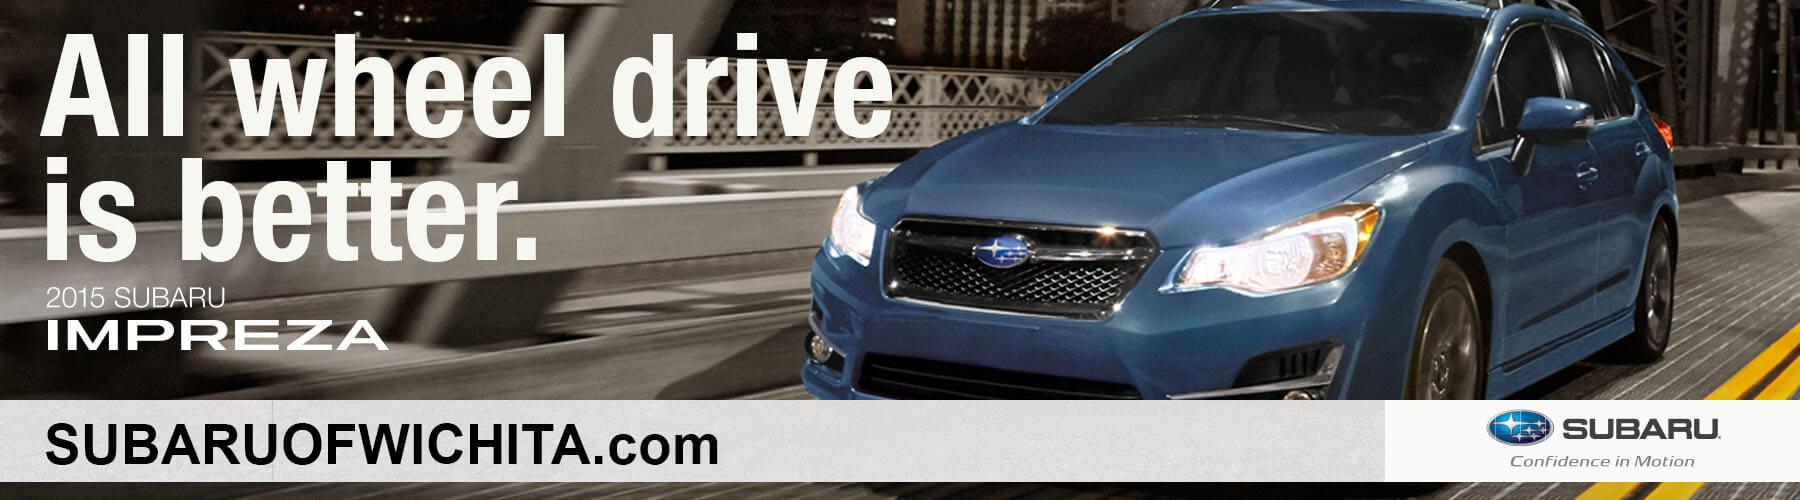 15 All Wheel Drive Is Better Subaru Impreza